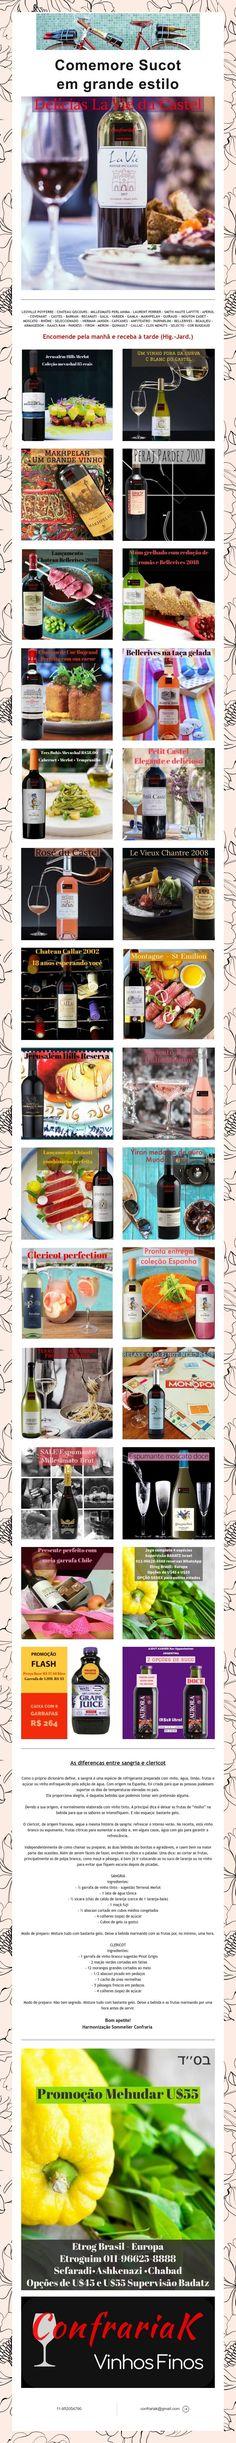 Comemore Sucot em grande estilo Mouton Cadet, Laurent Perrier, Grande, Wine Pairings, Style